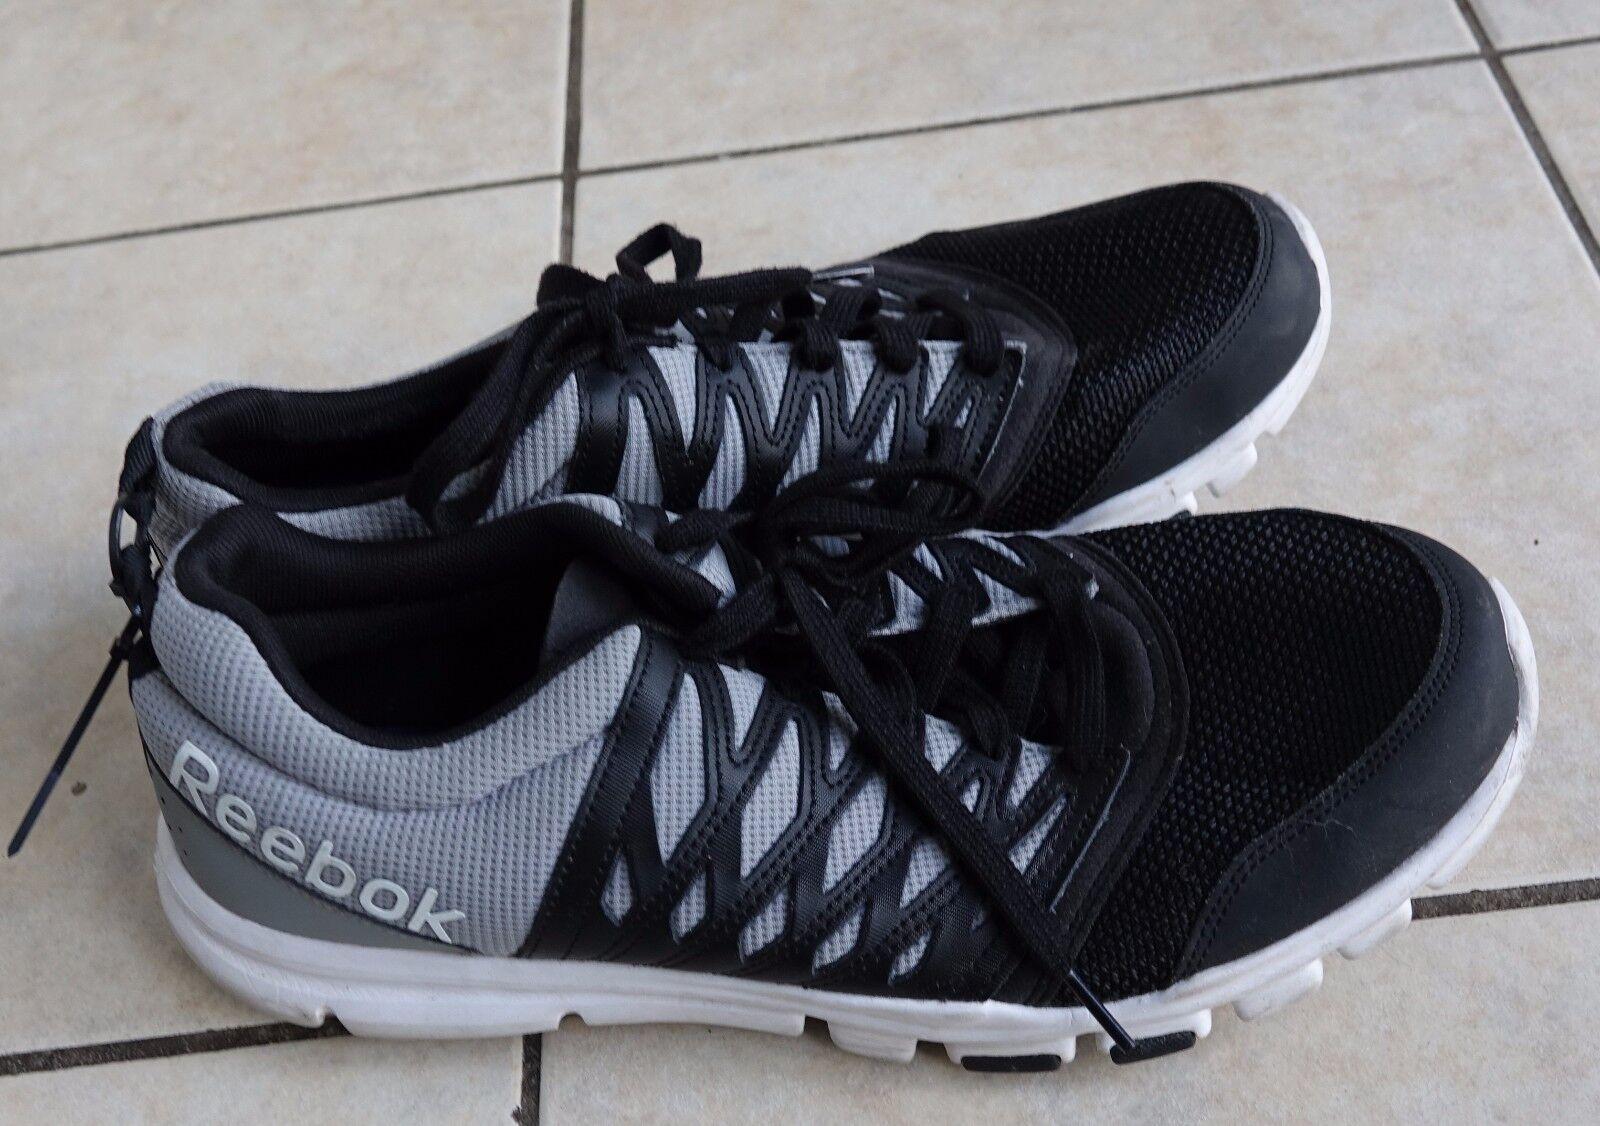 Reebok Yourflex Train RS 5.0l Black/flat Grey/white Training sneaker shoes, 13